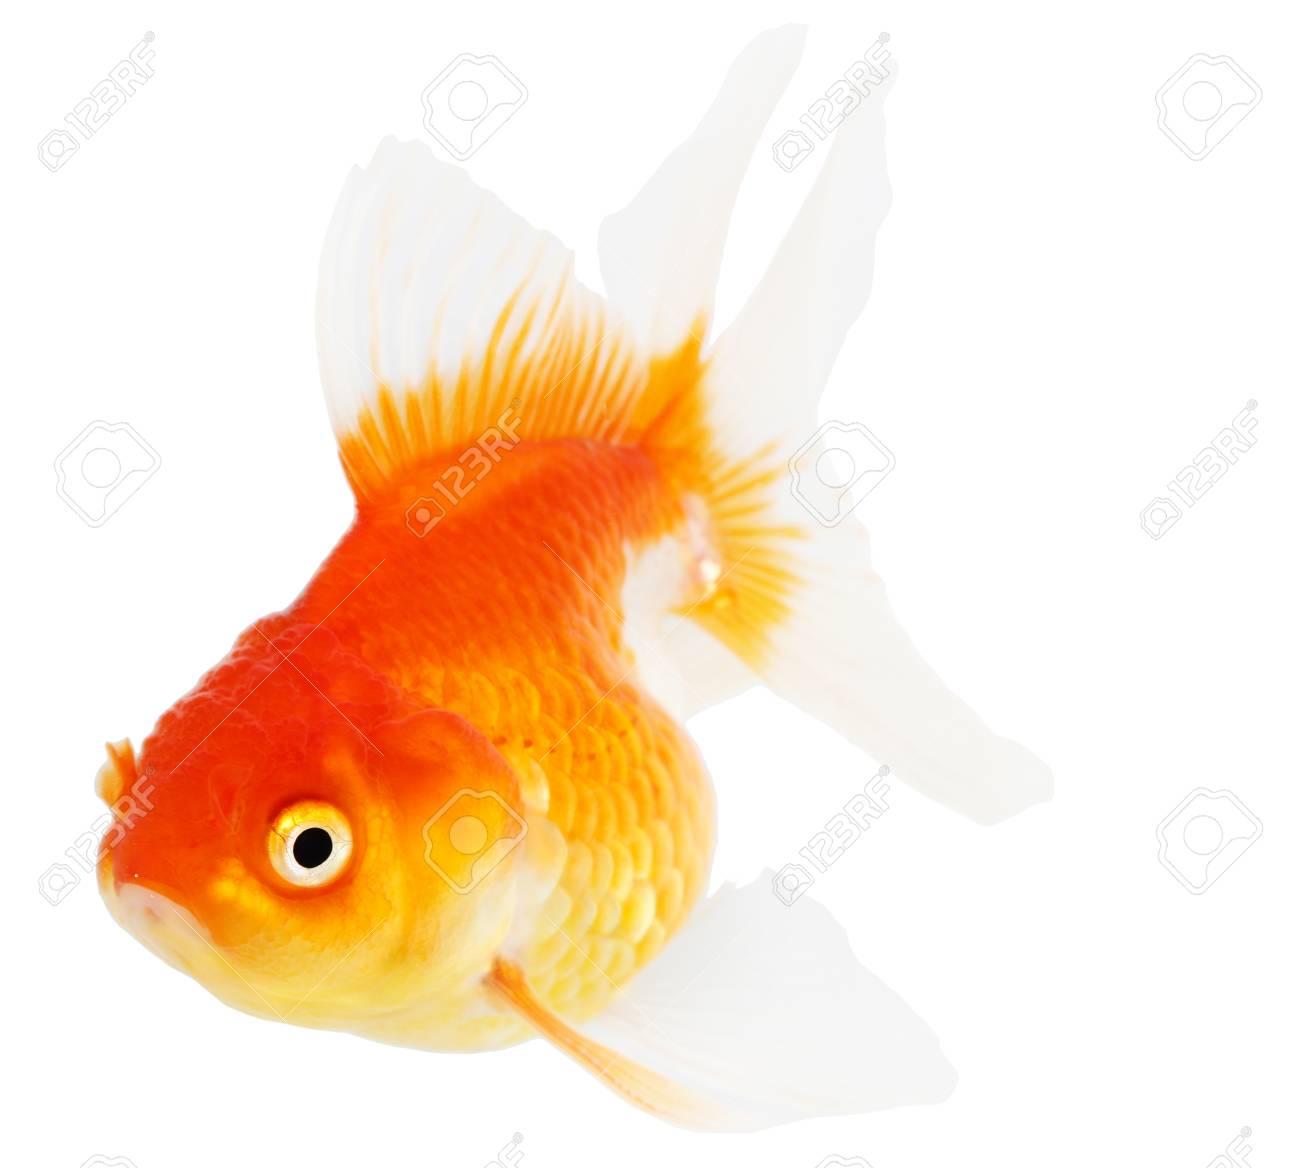 Gold fish  Isolation  on the white Stock Photo - 18465406